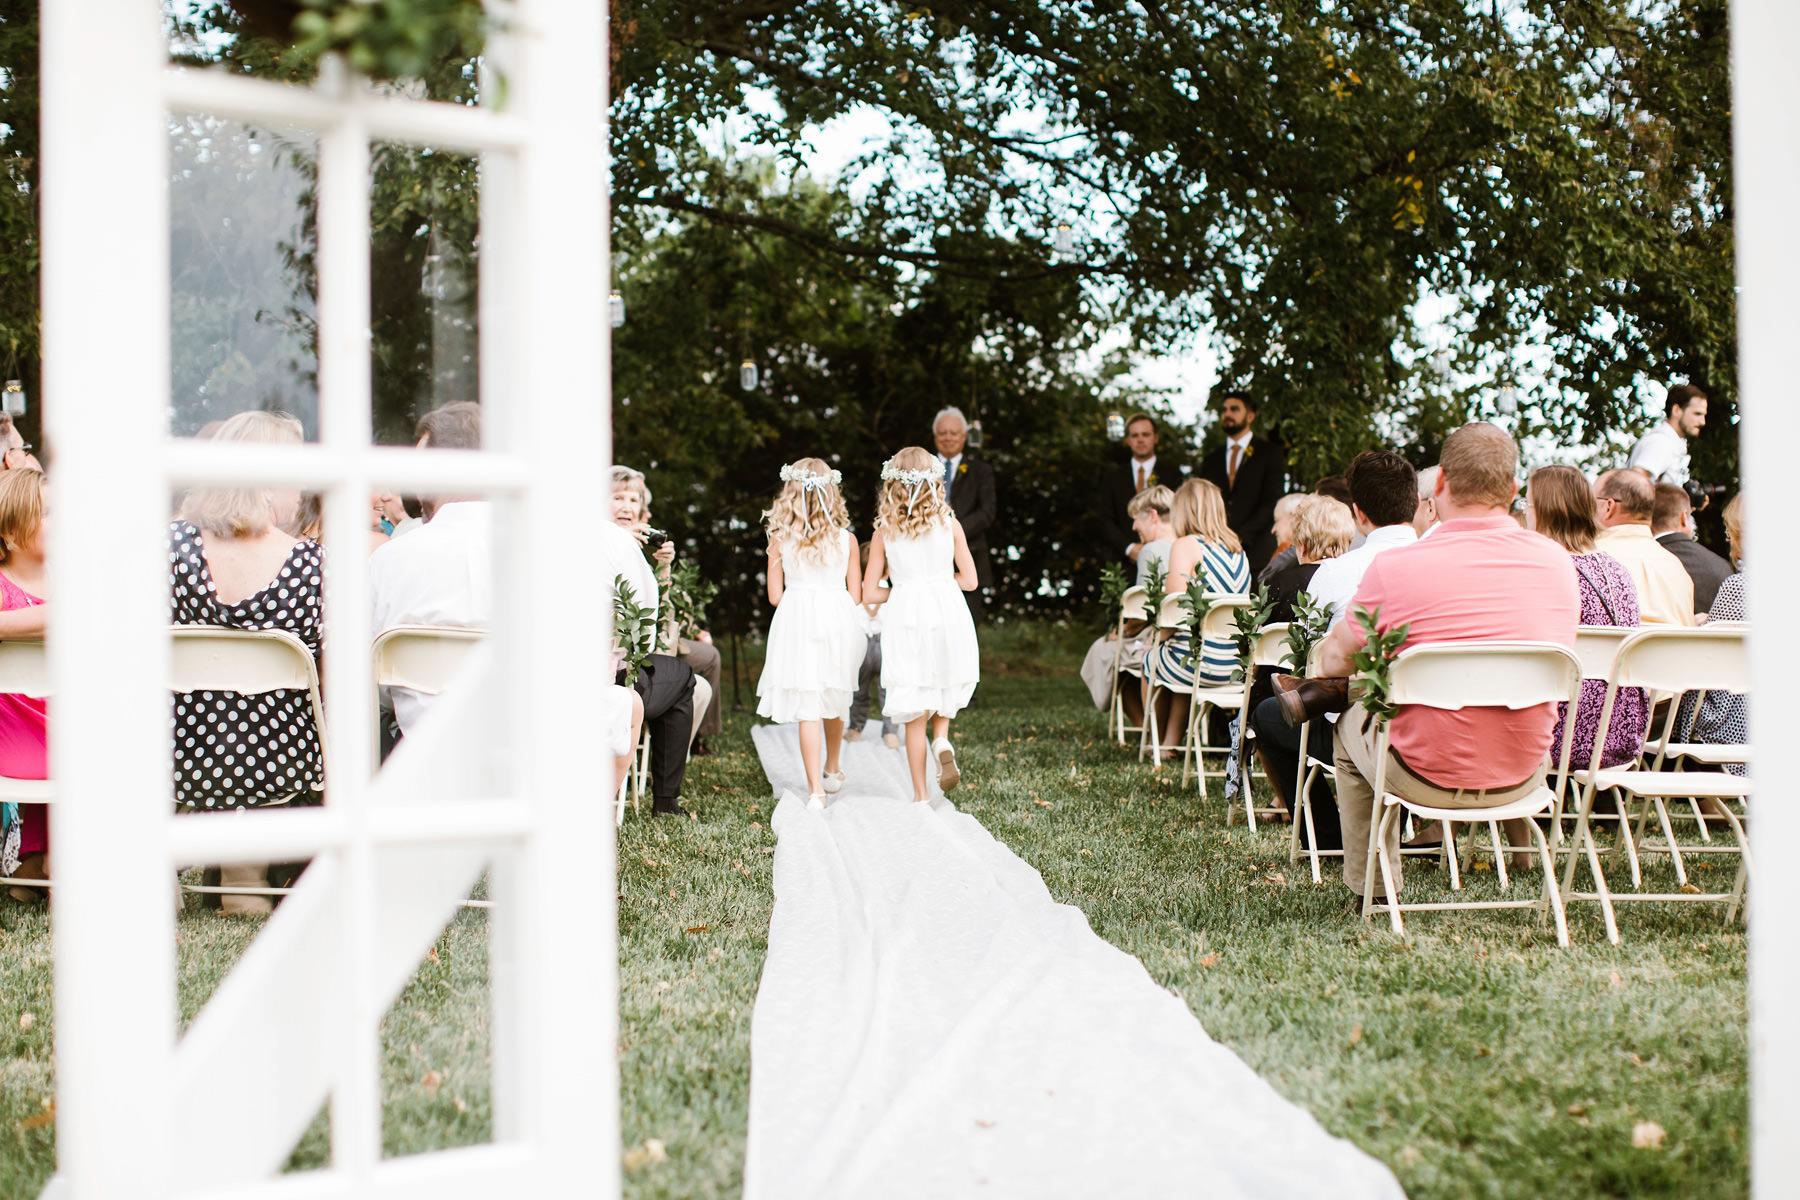 Alldredge Orchard Kansas City_Kindling Wedding Photography BLOG 37.JPG